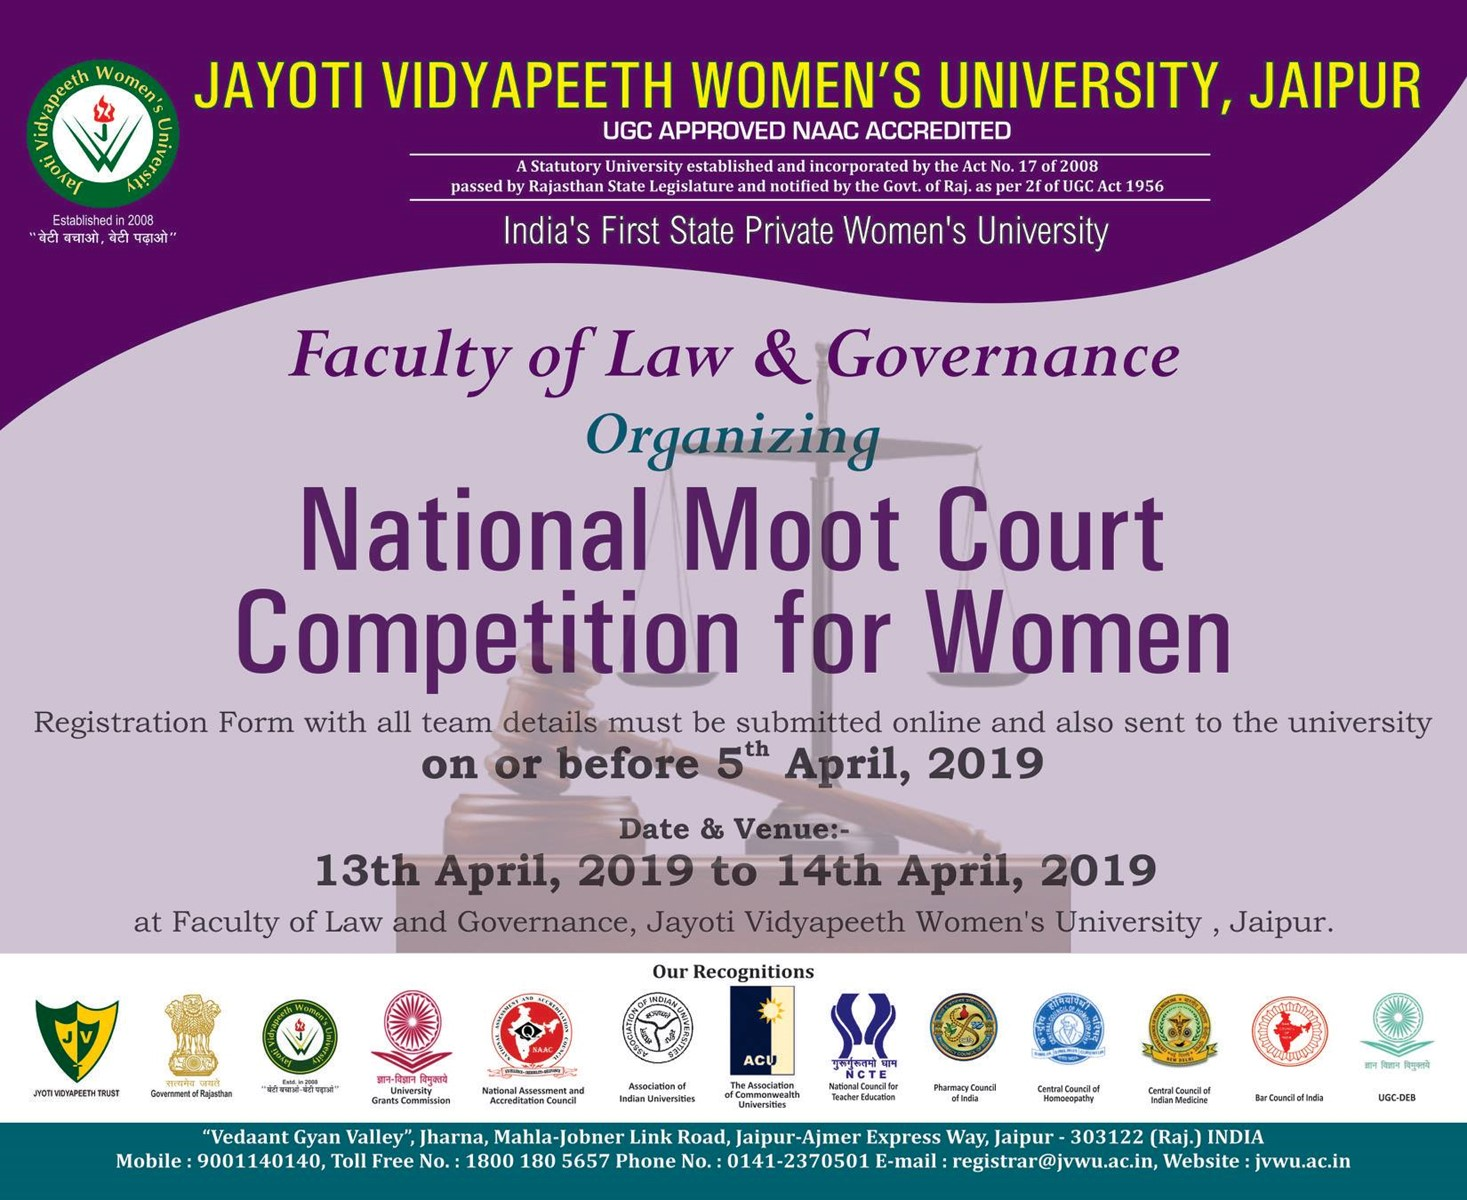 Jayoti Vidyapeeth Women's University, JVWU, University in